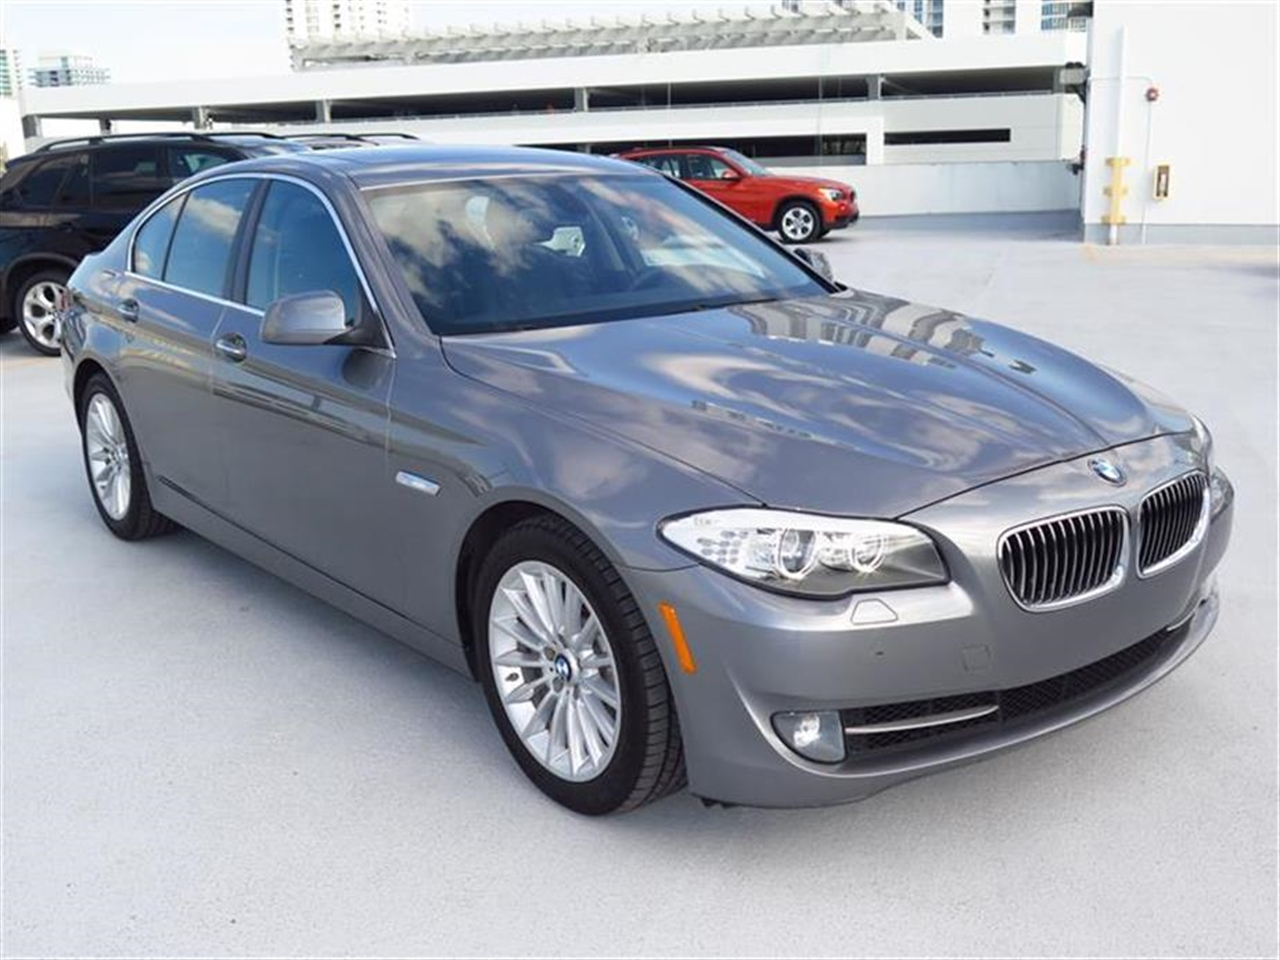 2012 BMW 5 SERIES 4dr Sdn 535i RWD 11658 miles 10-way power-adjustable front bucket seats -inc 4